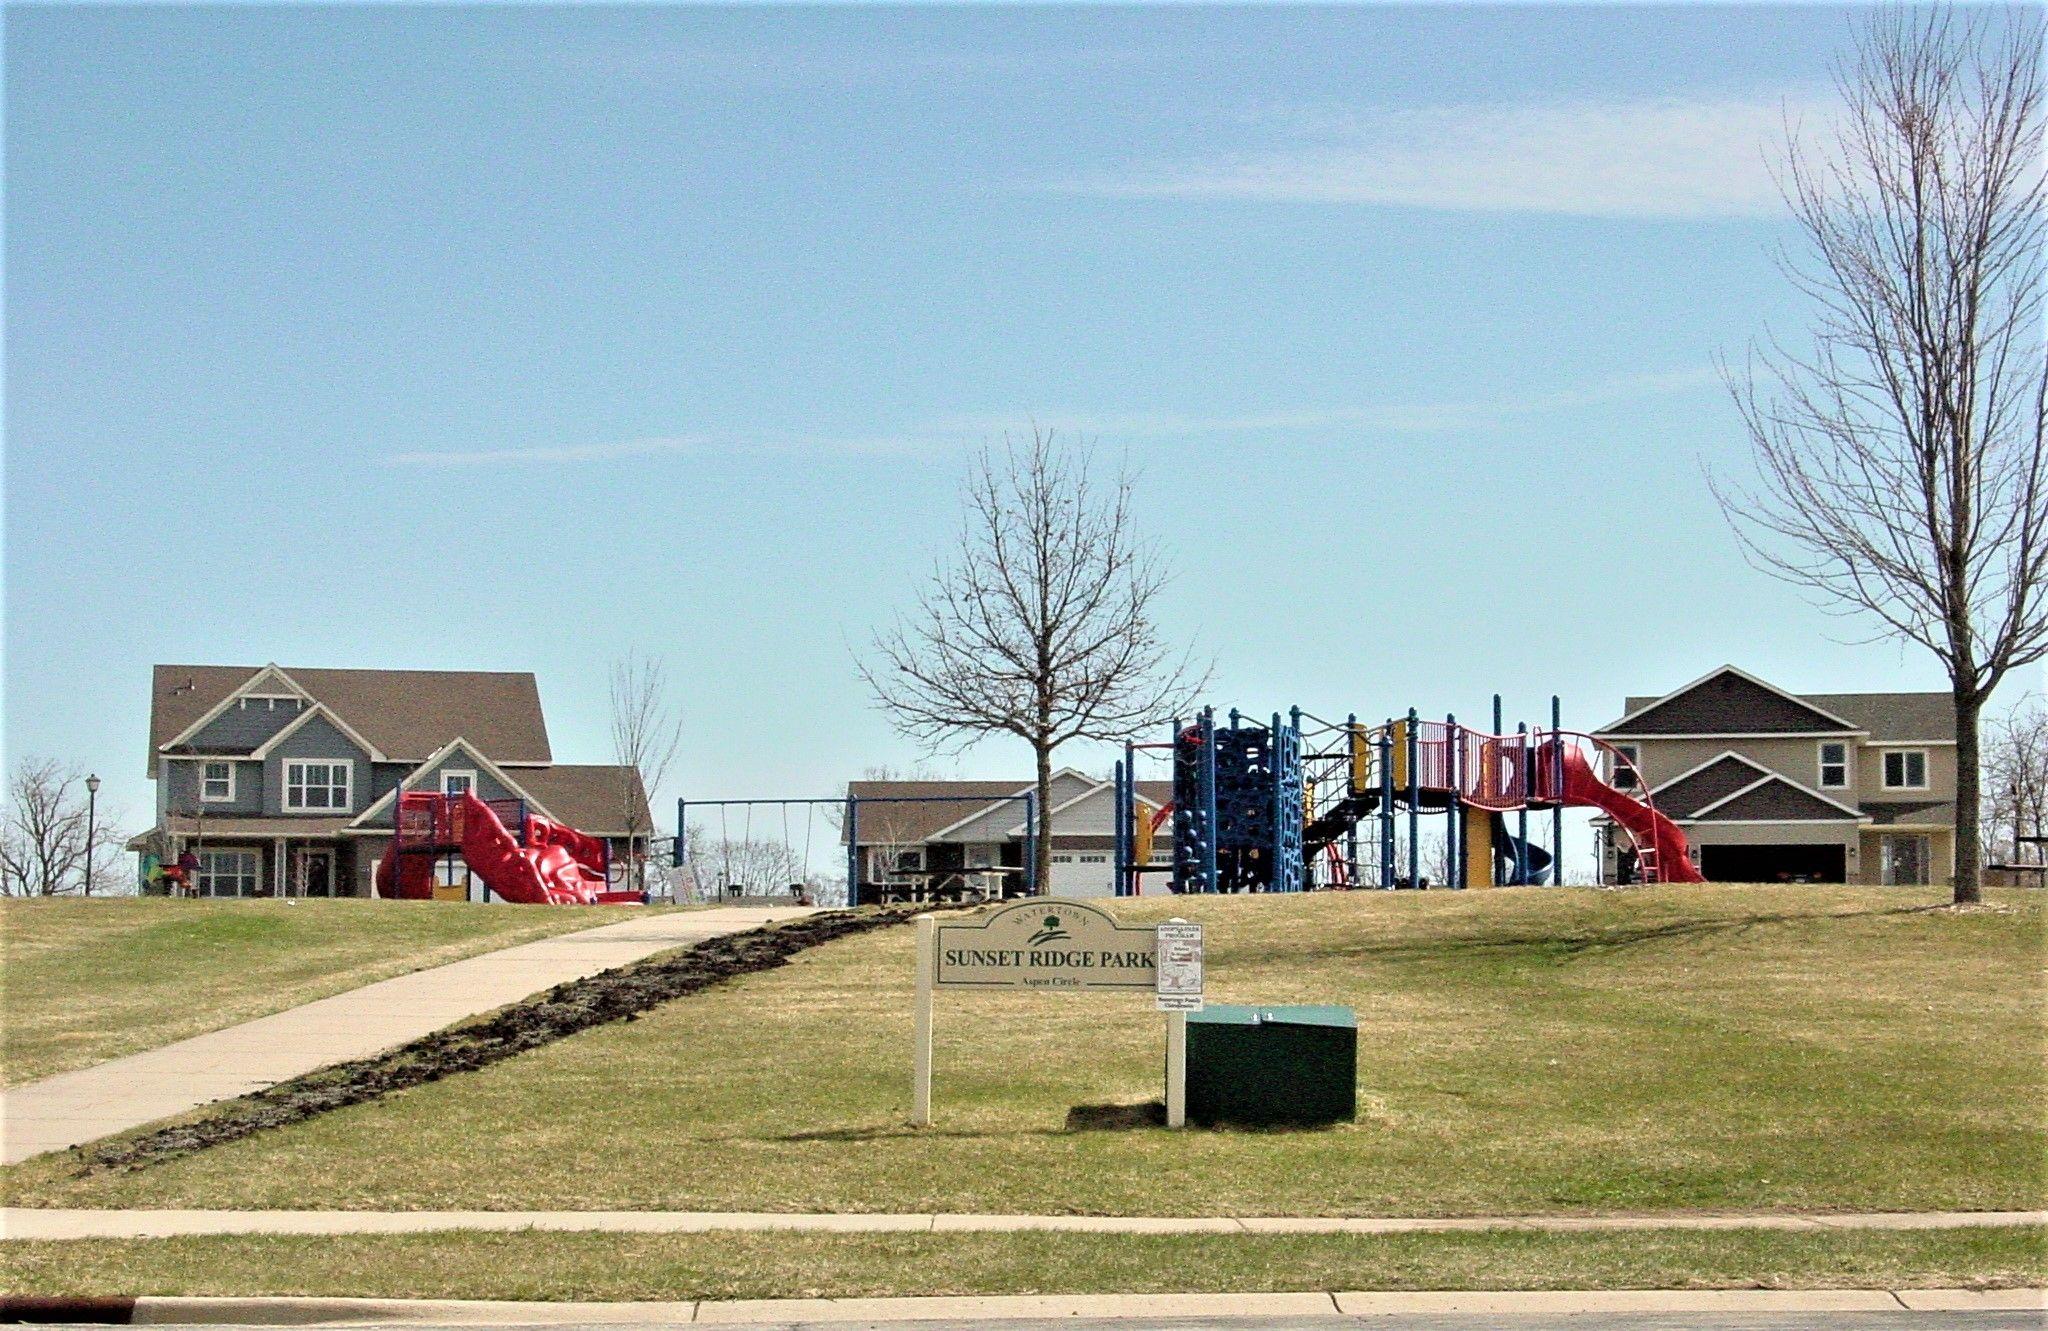 Convenient Neighborhood Park just blocks away